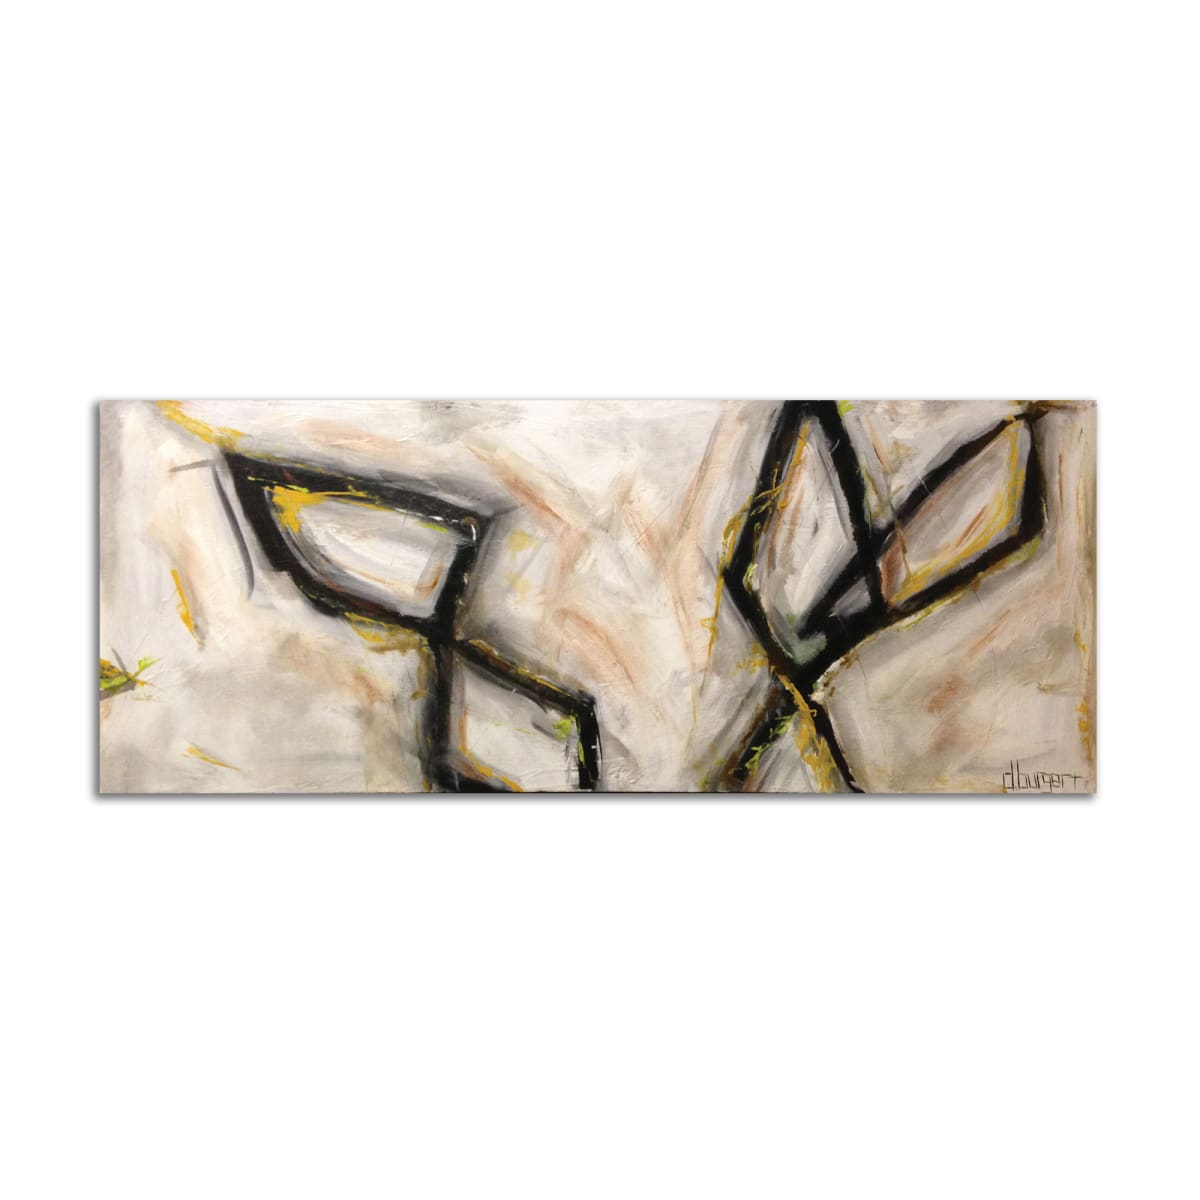 Smodern Diamonds by Dustin Burgert